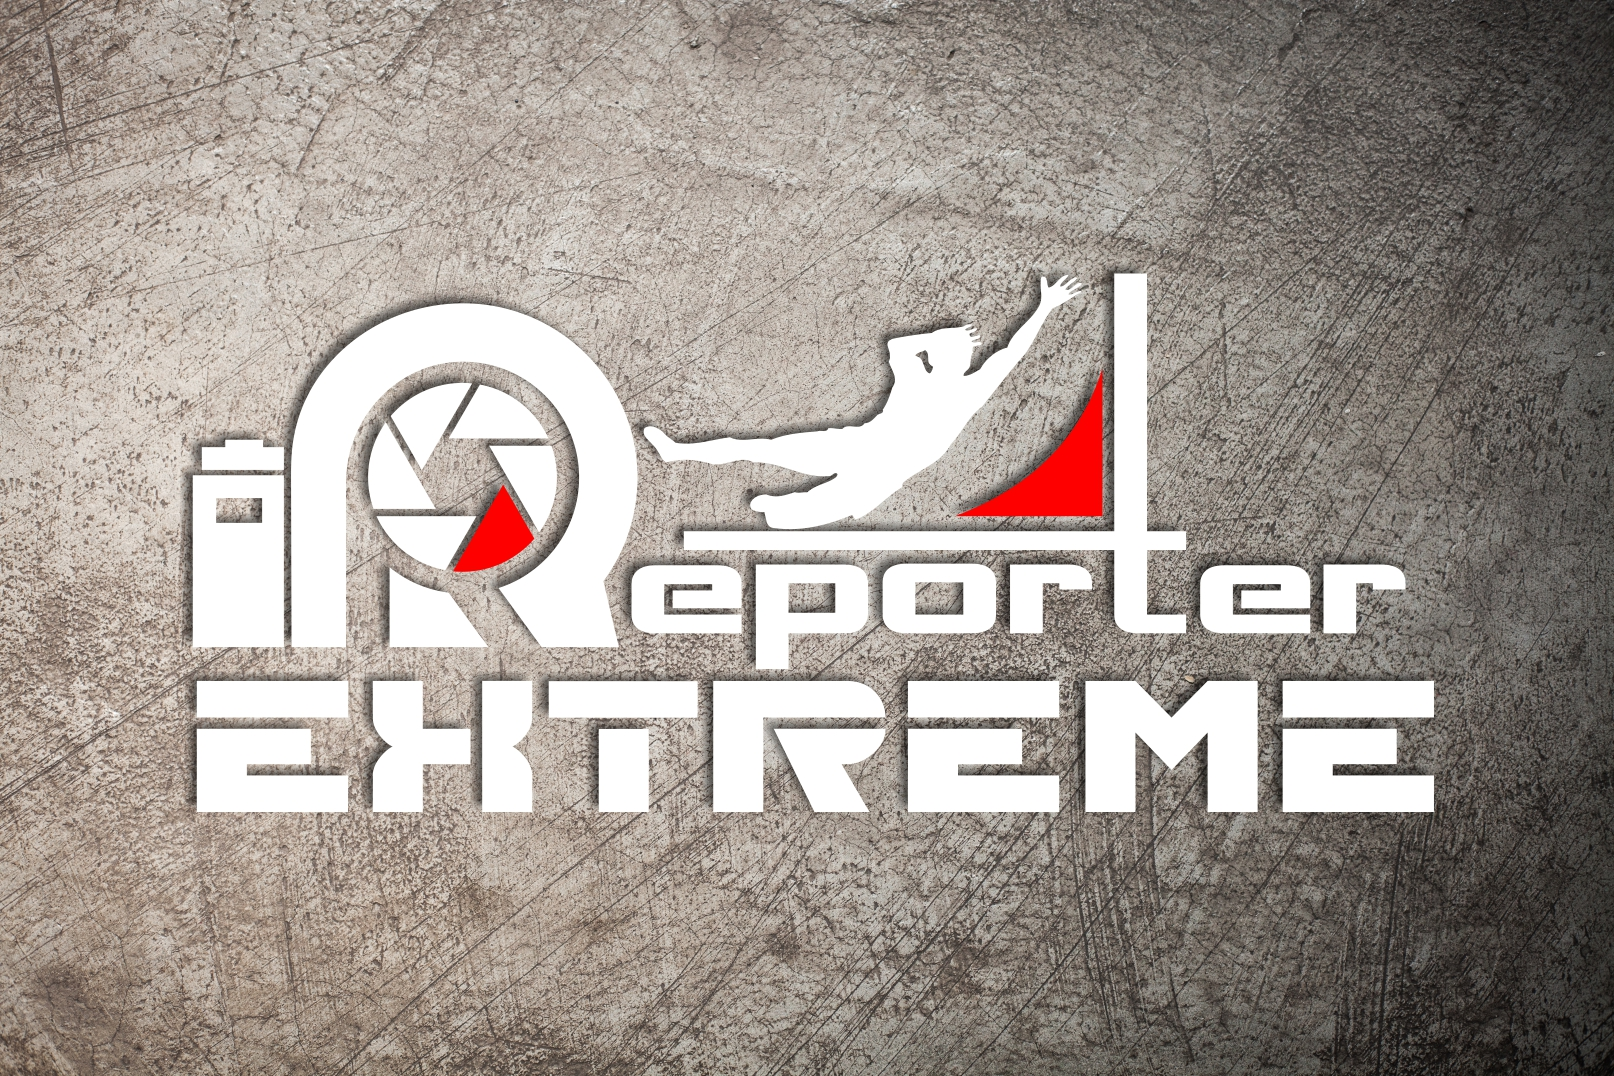 Логотип для экстрим фотографа.  фото f_4825a51f8f289092.jpg